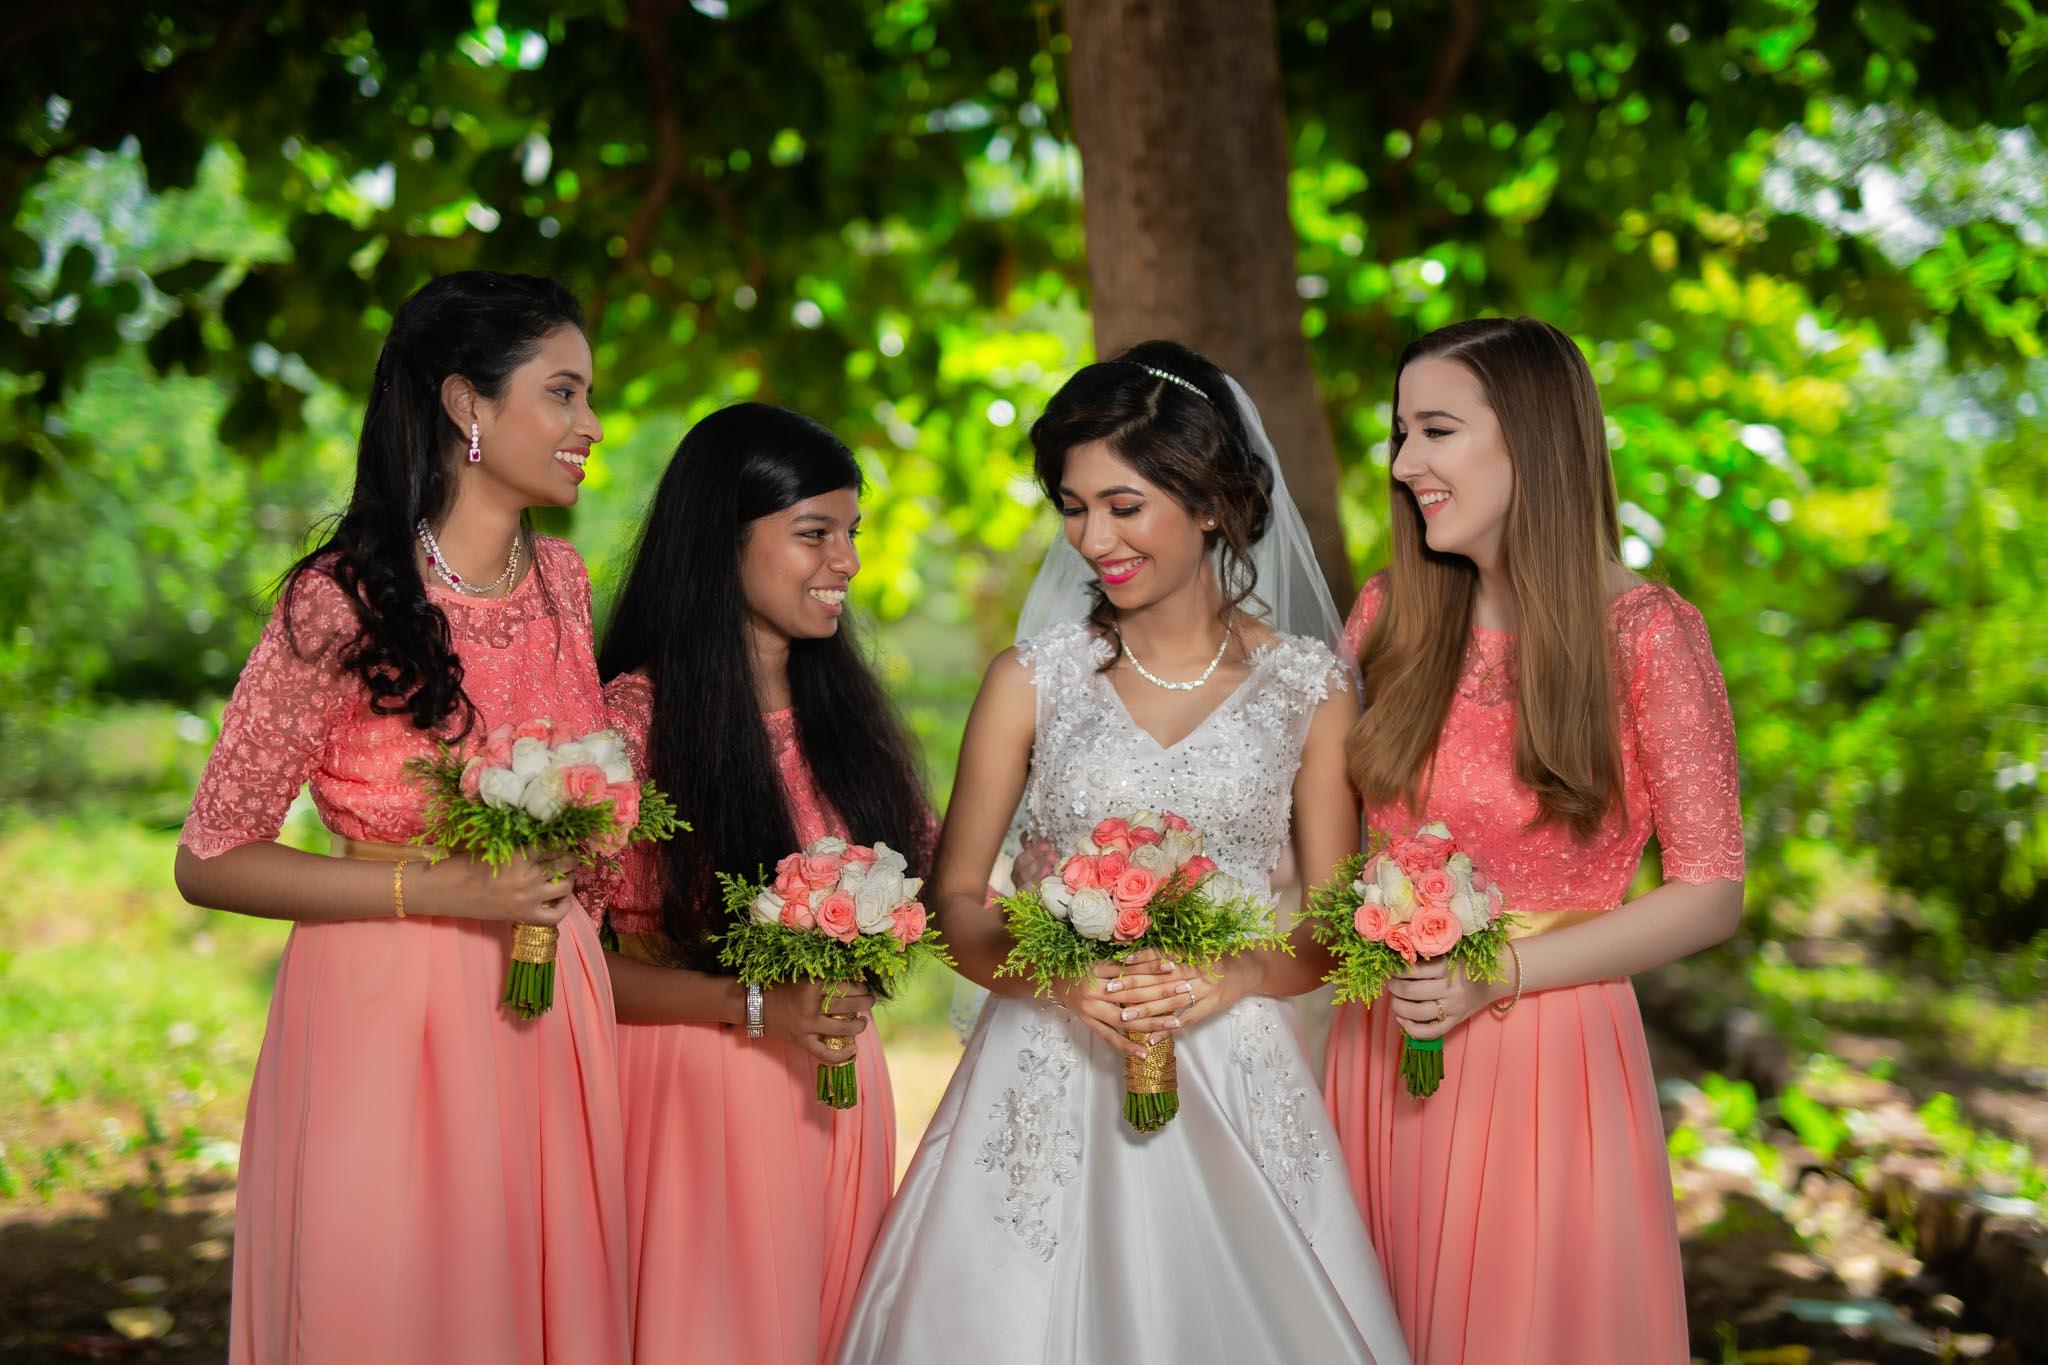 Best-of-2018-wedding-photography-focuz-studios-33